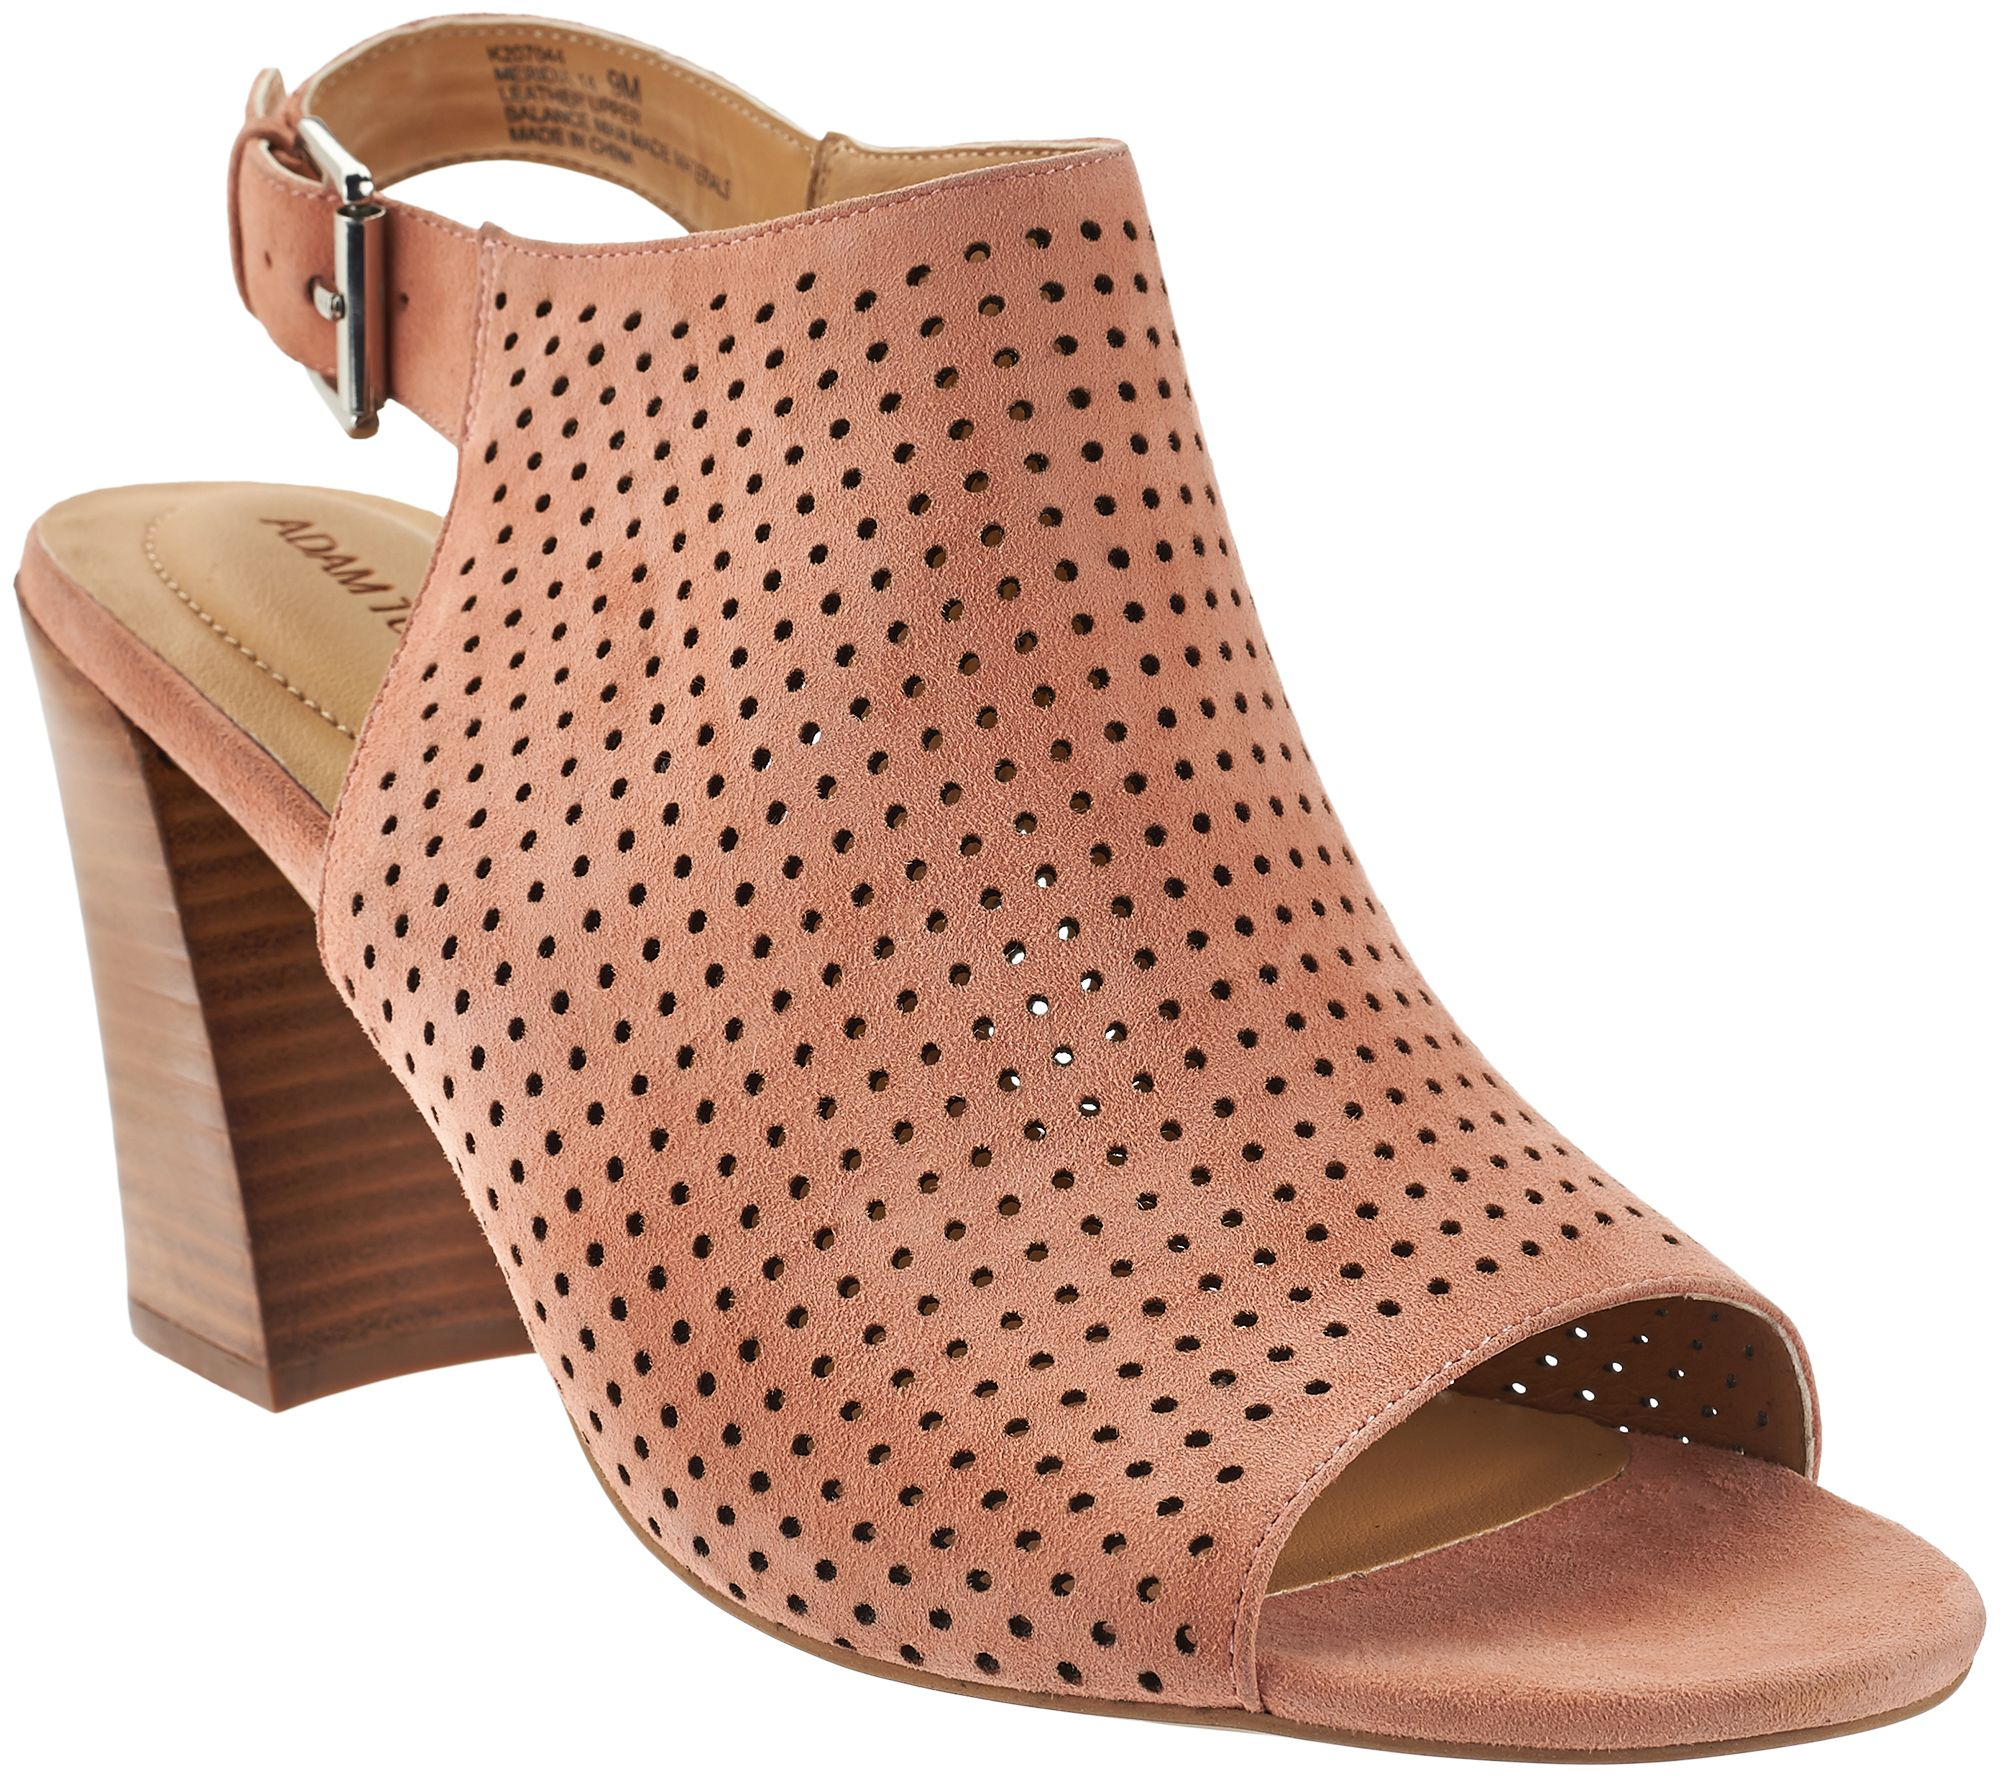 Adam Tucker Perforated SuedePeep-toe Sandals - Meridia cheap sale best place uGV65